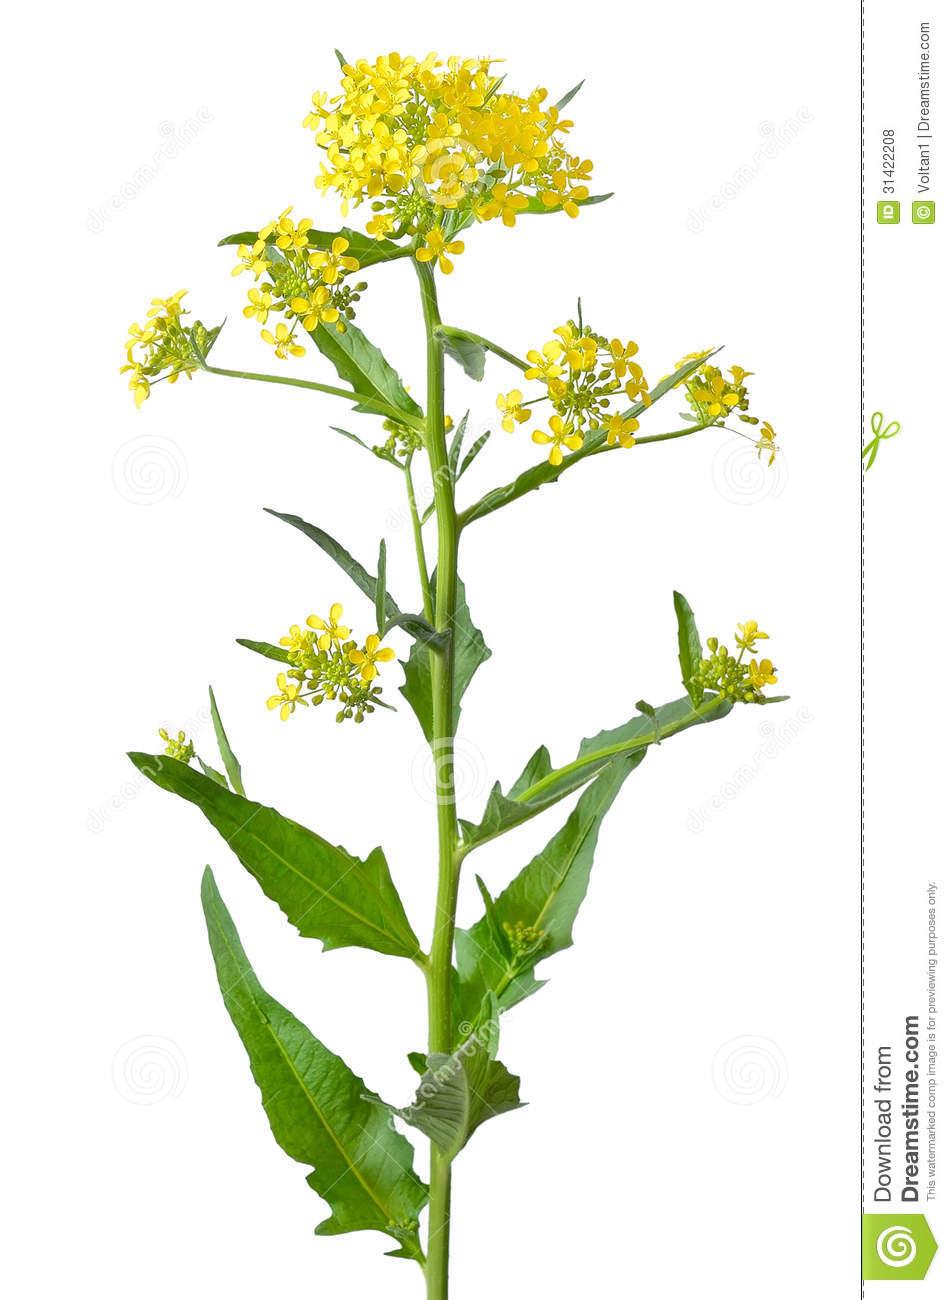 Brassica Campestris Flower Royalty Free Stock Photos.